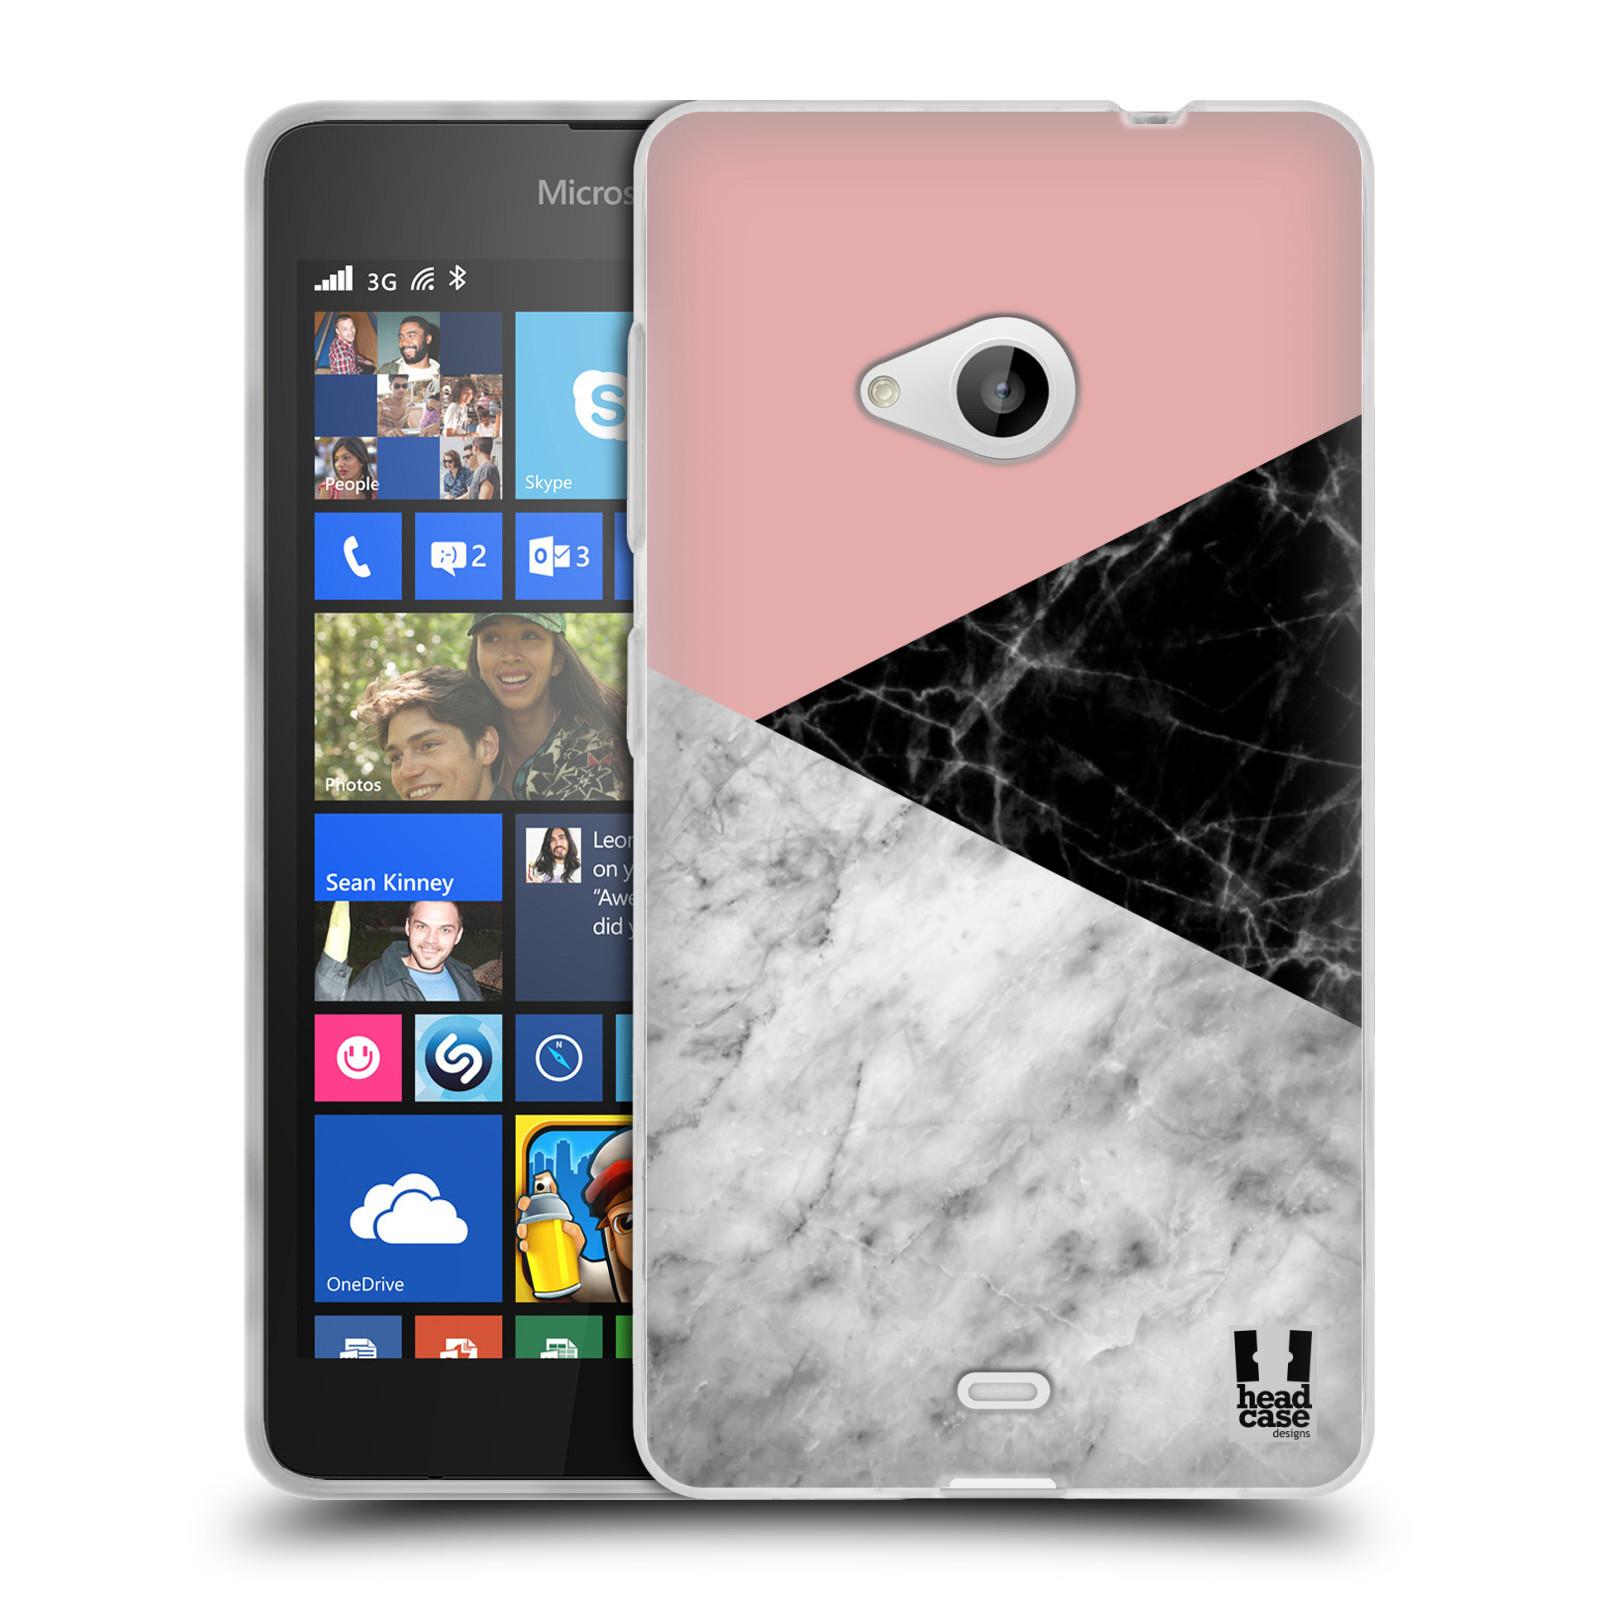 Silikonové pouzdro na mobil Microsoft Lumia 535 - Head Case - Mramor mix